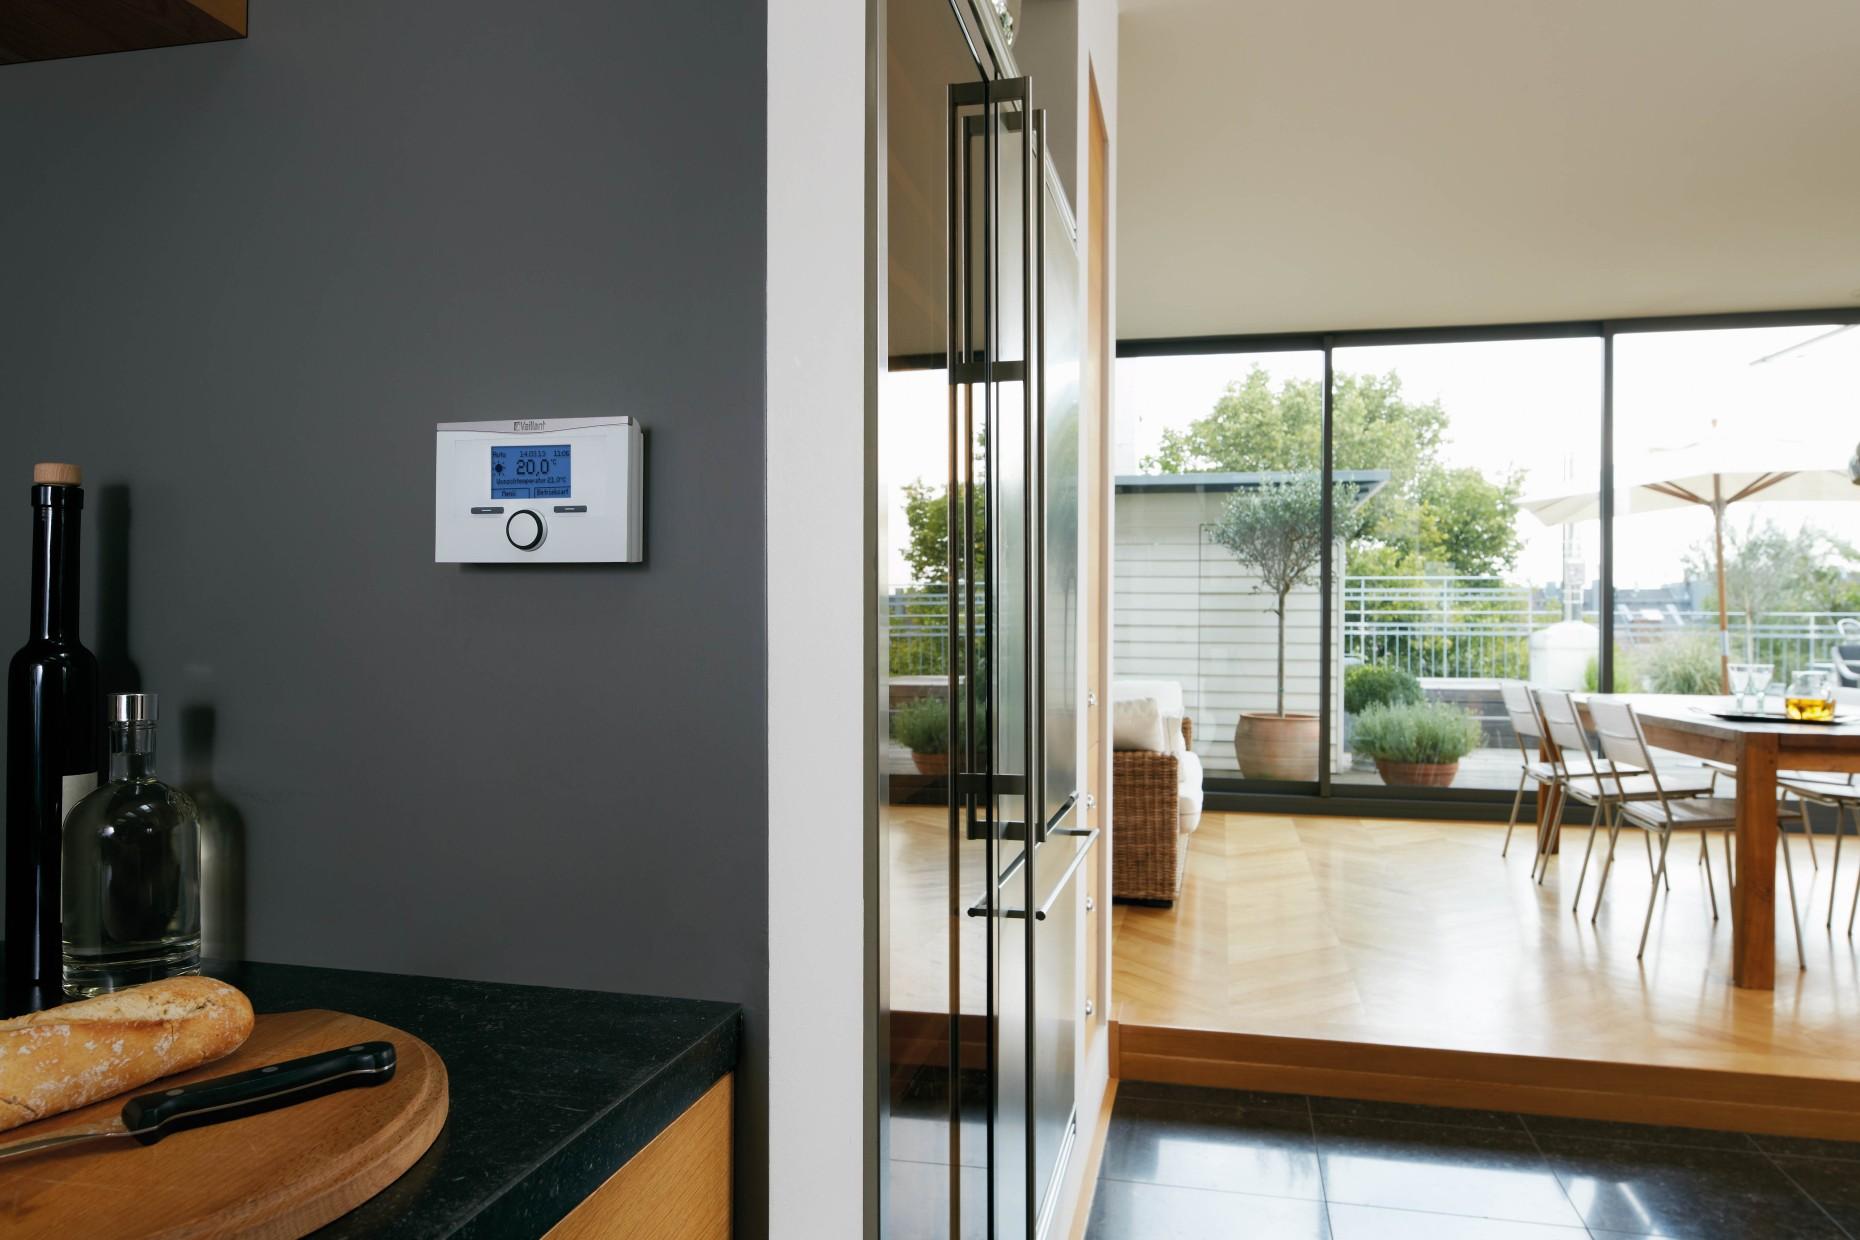 vaillant calormatic vrt 350f termostato ambiente regolabile modulante wireless ebay. Black Bedroom Furniture Sets. Home Design Ideas